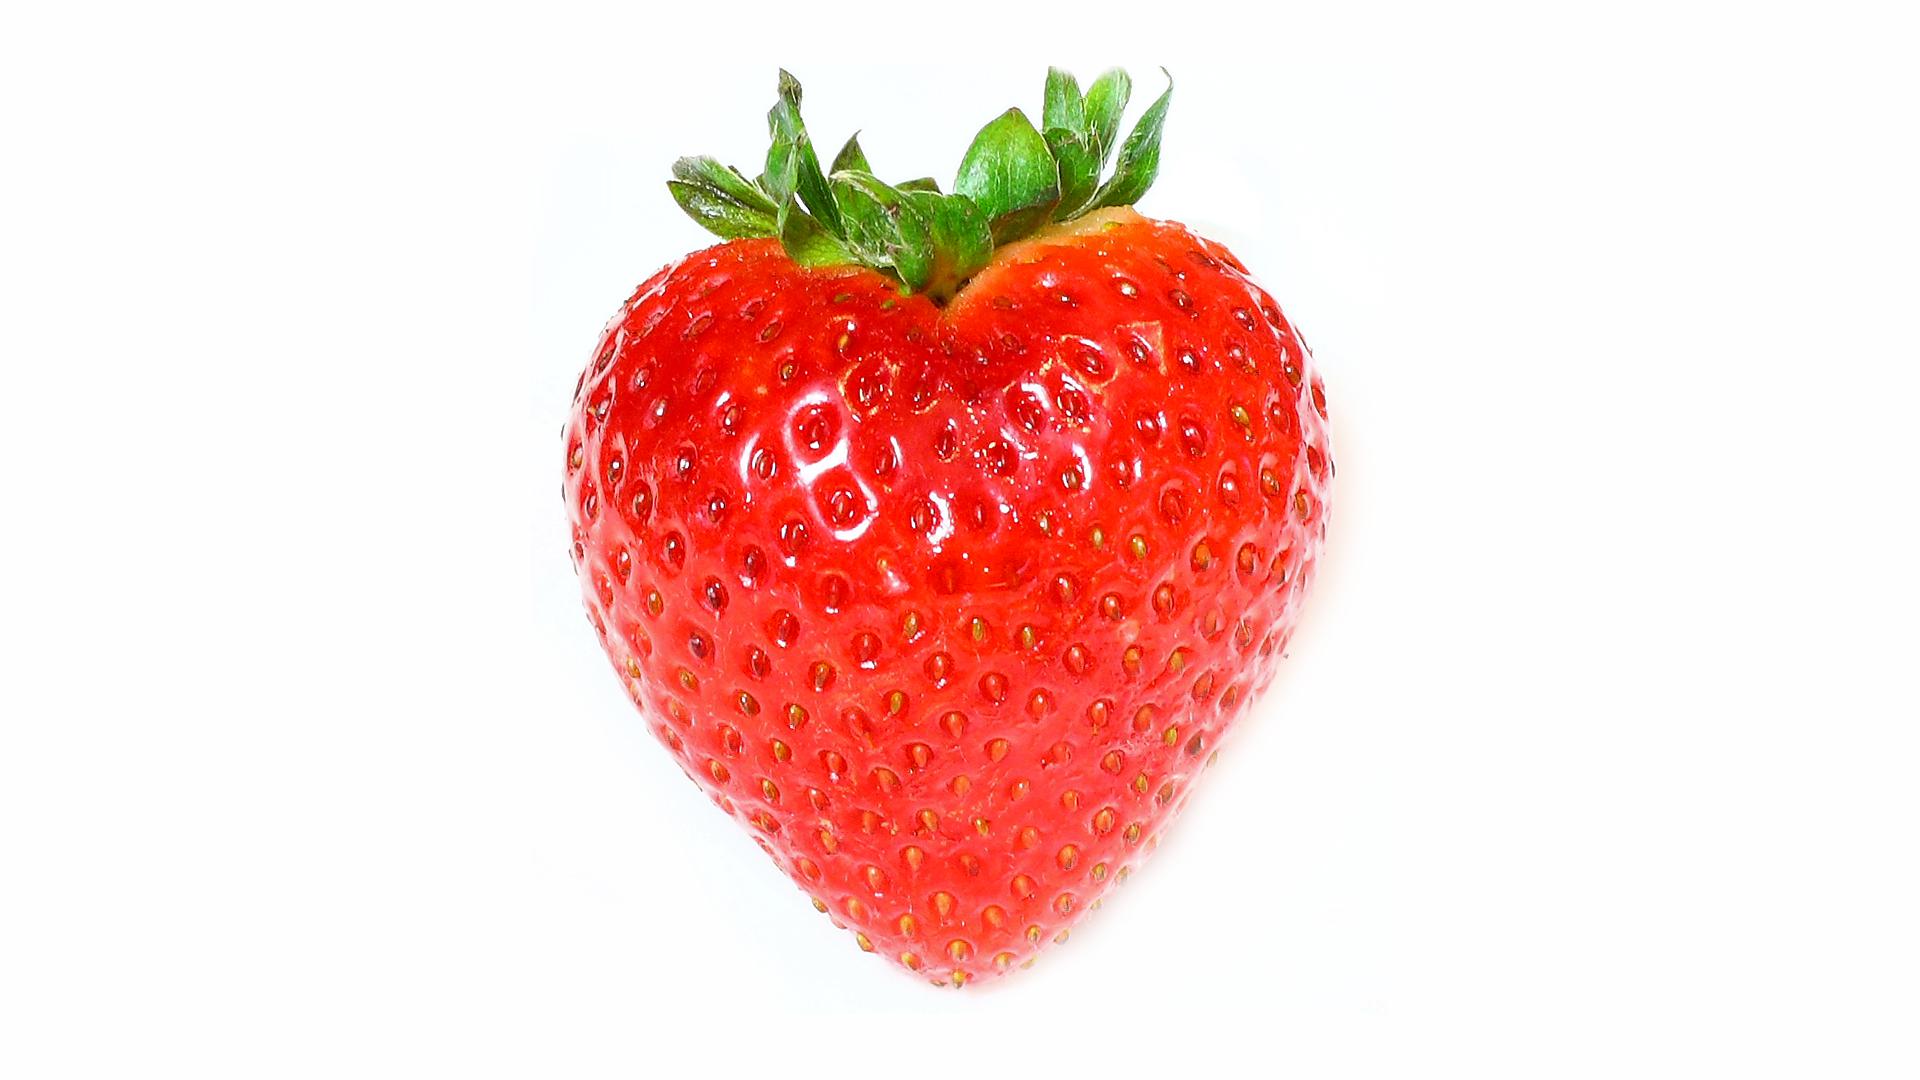 Red Strawberry widescreen wallpaper   Wide-Wallpapers.NET